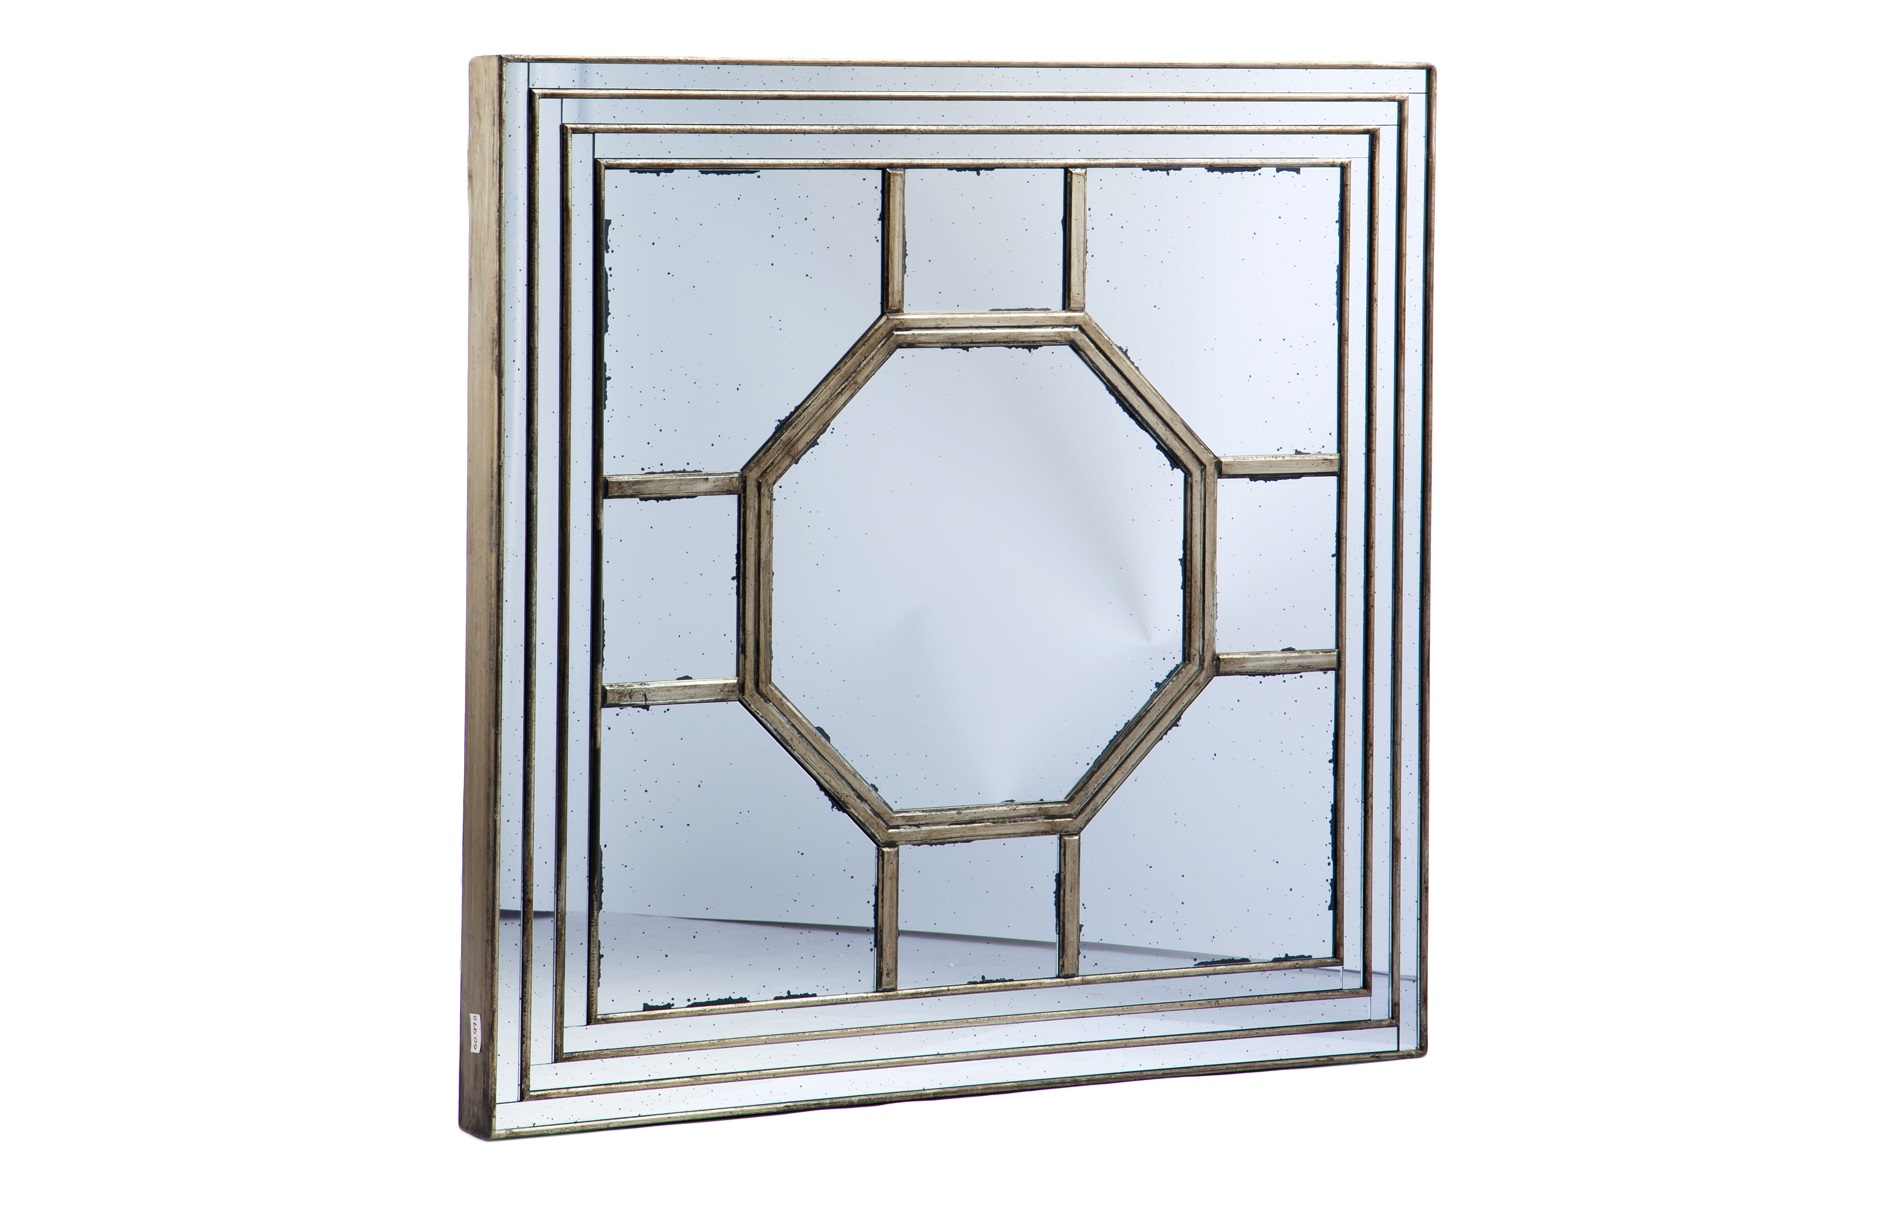 ЗеркалоНастенные зеркала<br>Декоративное зеркало квадратной формы.<br><br>Material: Дерево<br>Width см: 121<br>Height см: 121